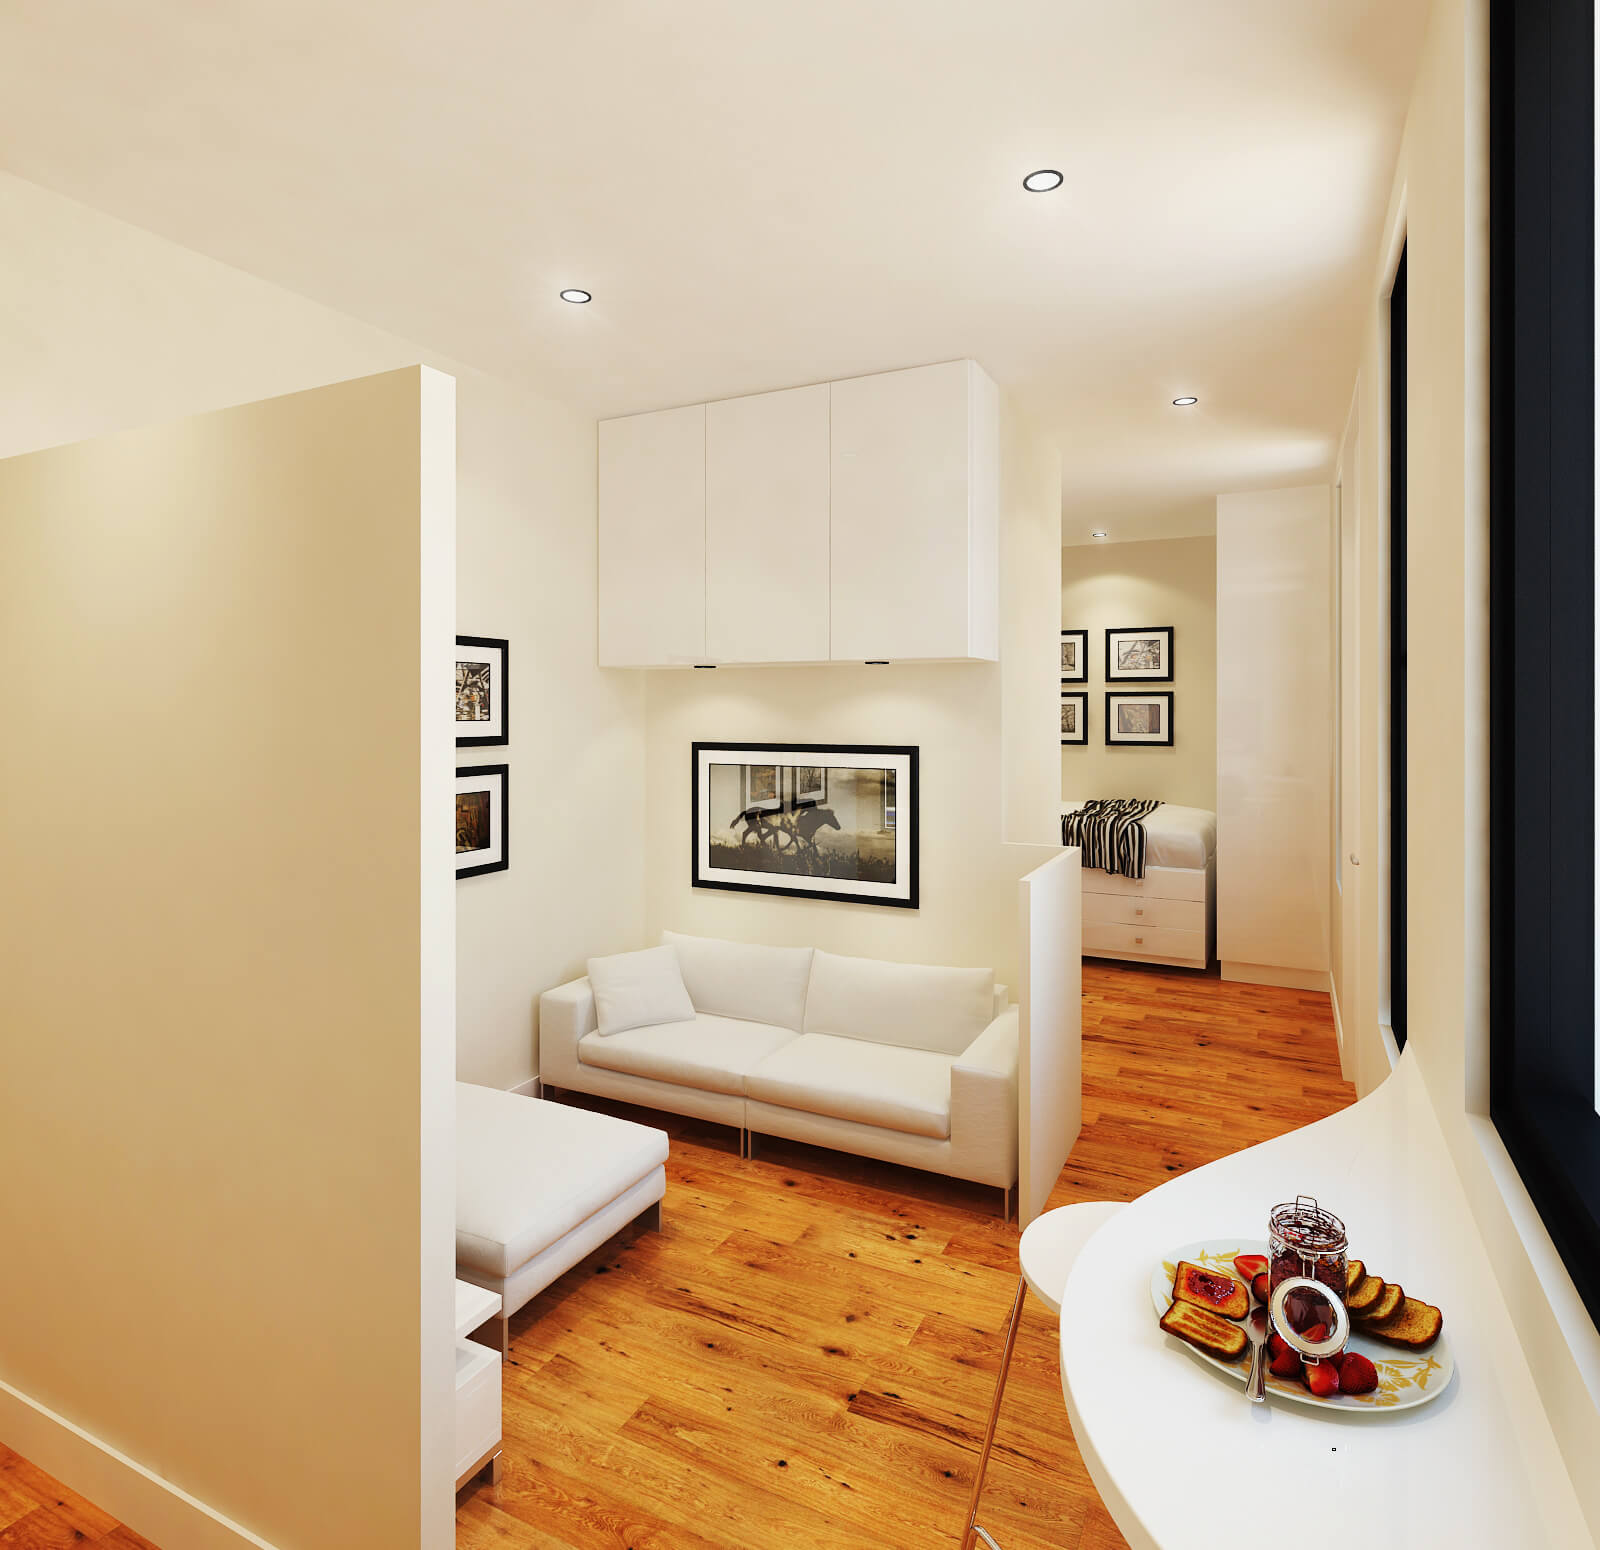 50-Studio Flat v2